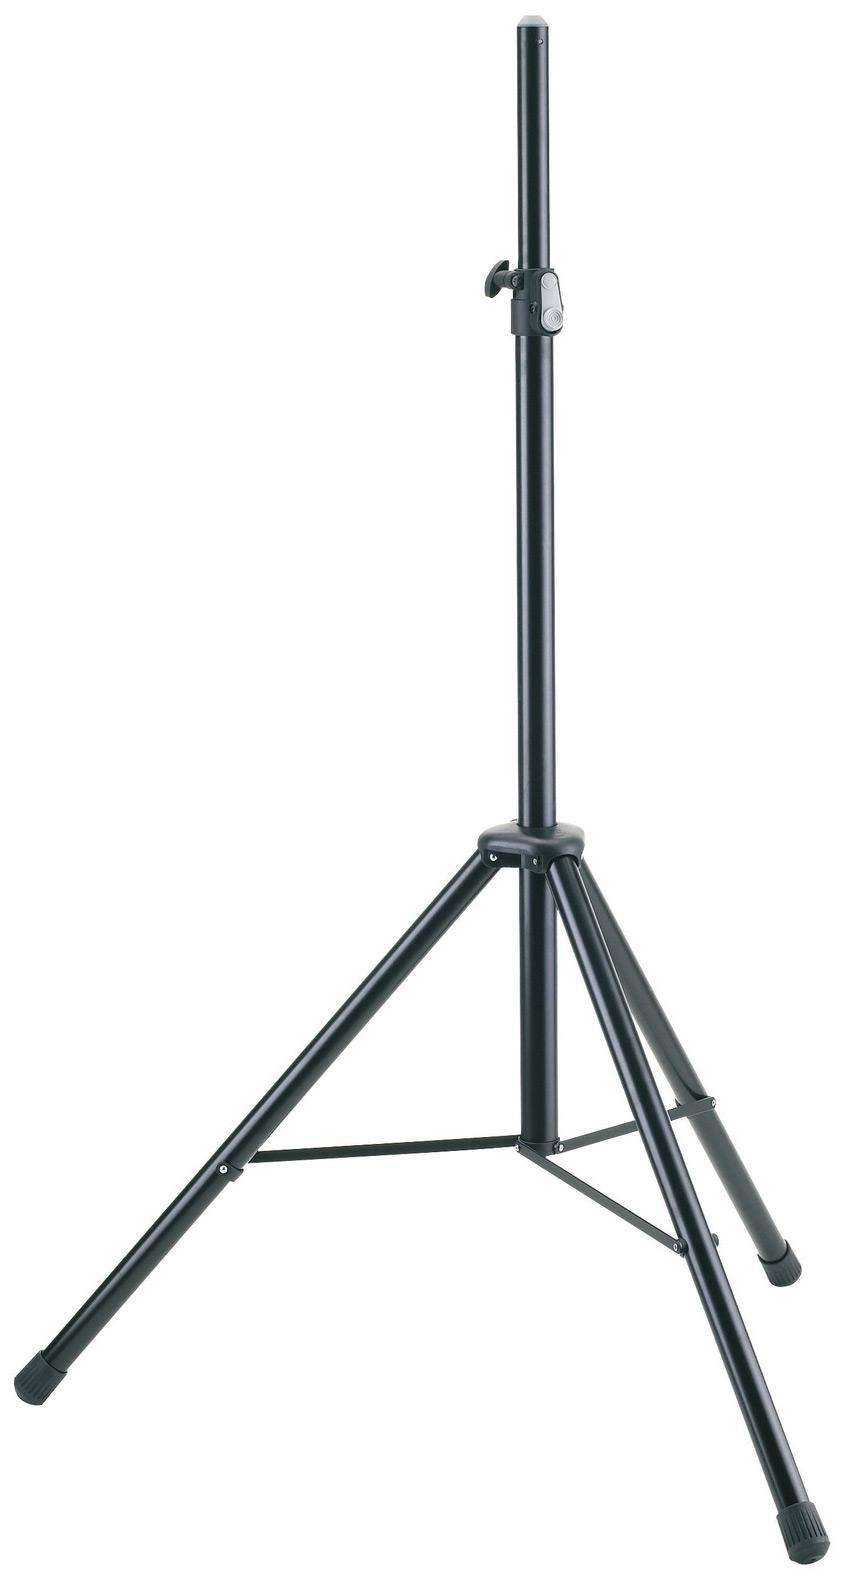 K&M Stands 21435-009-55 Black Speaker Stand 21435.177.55